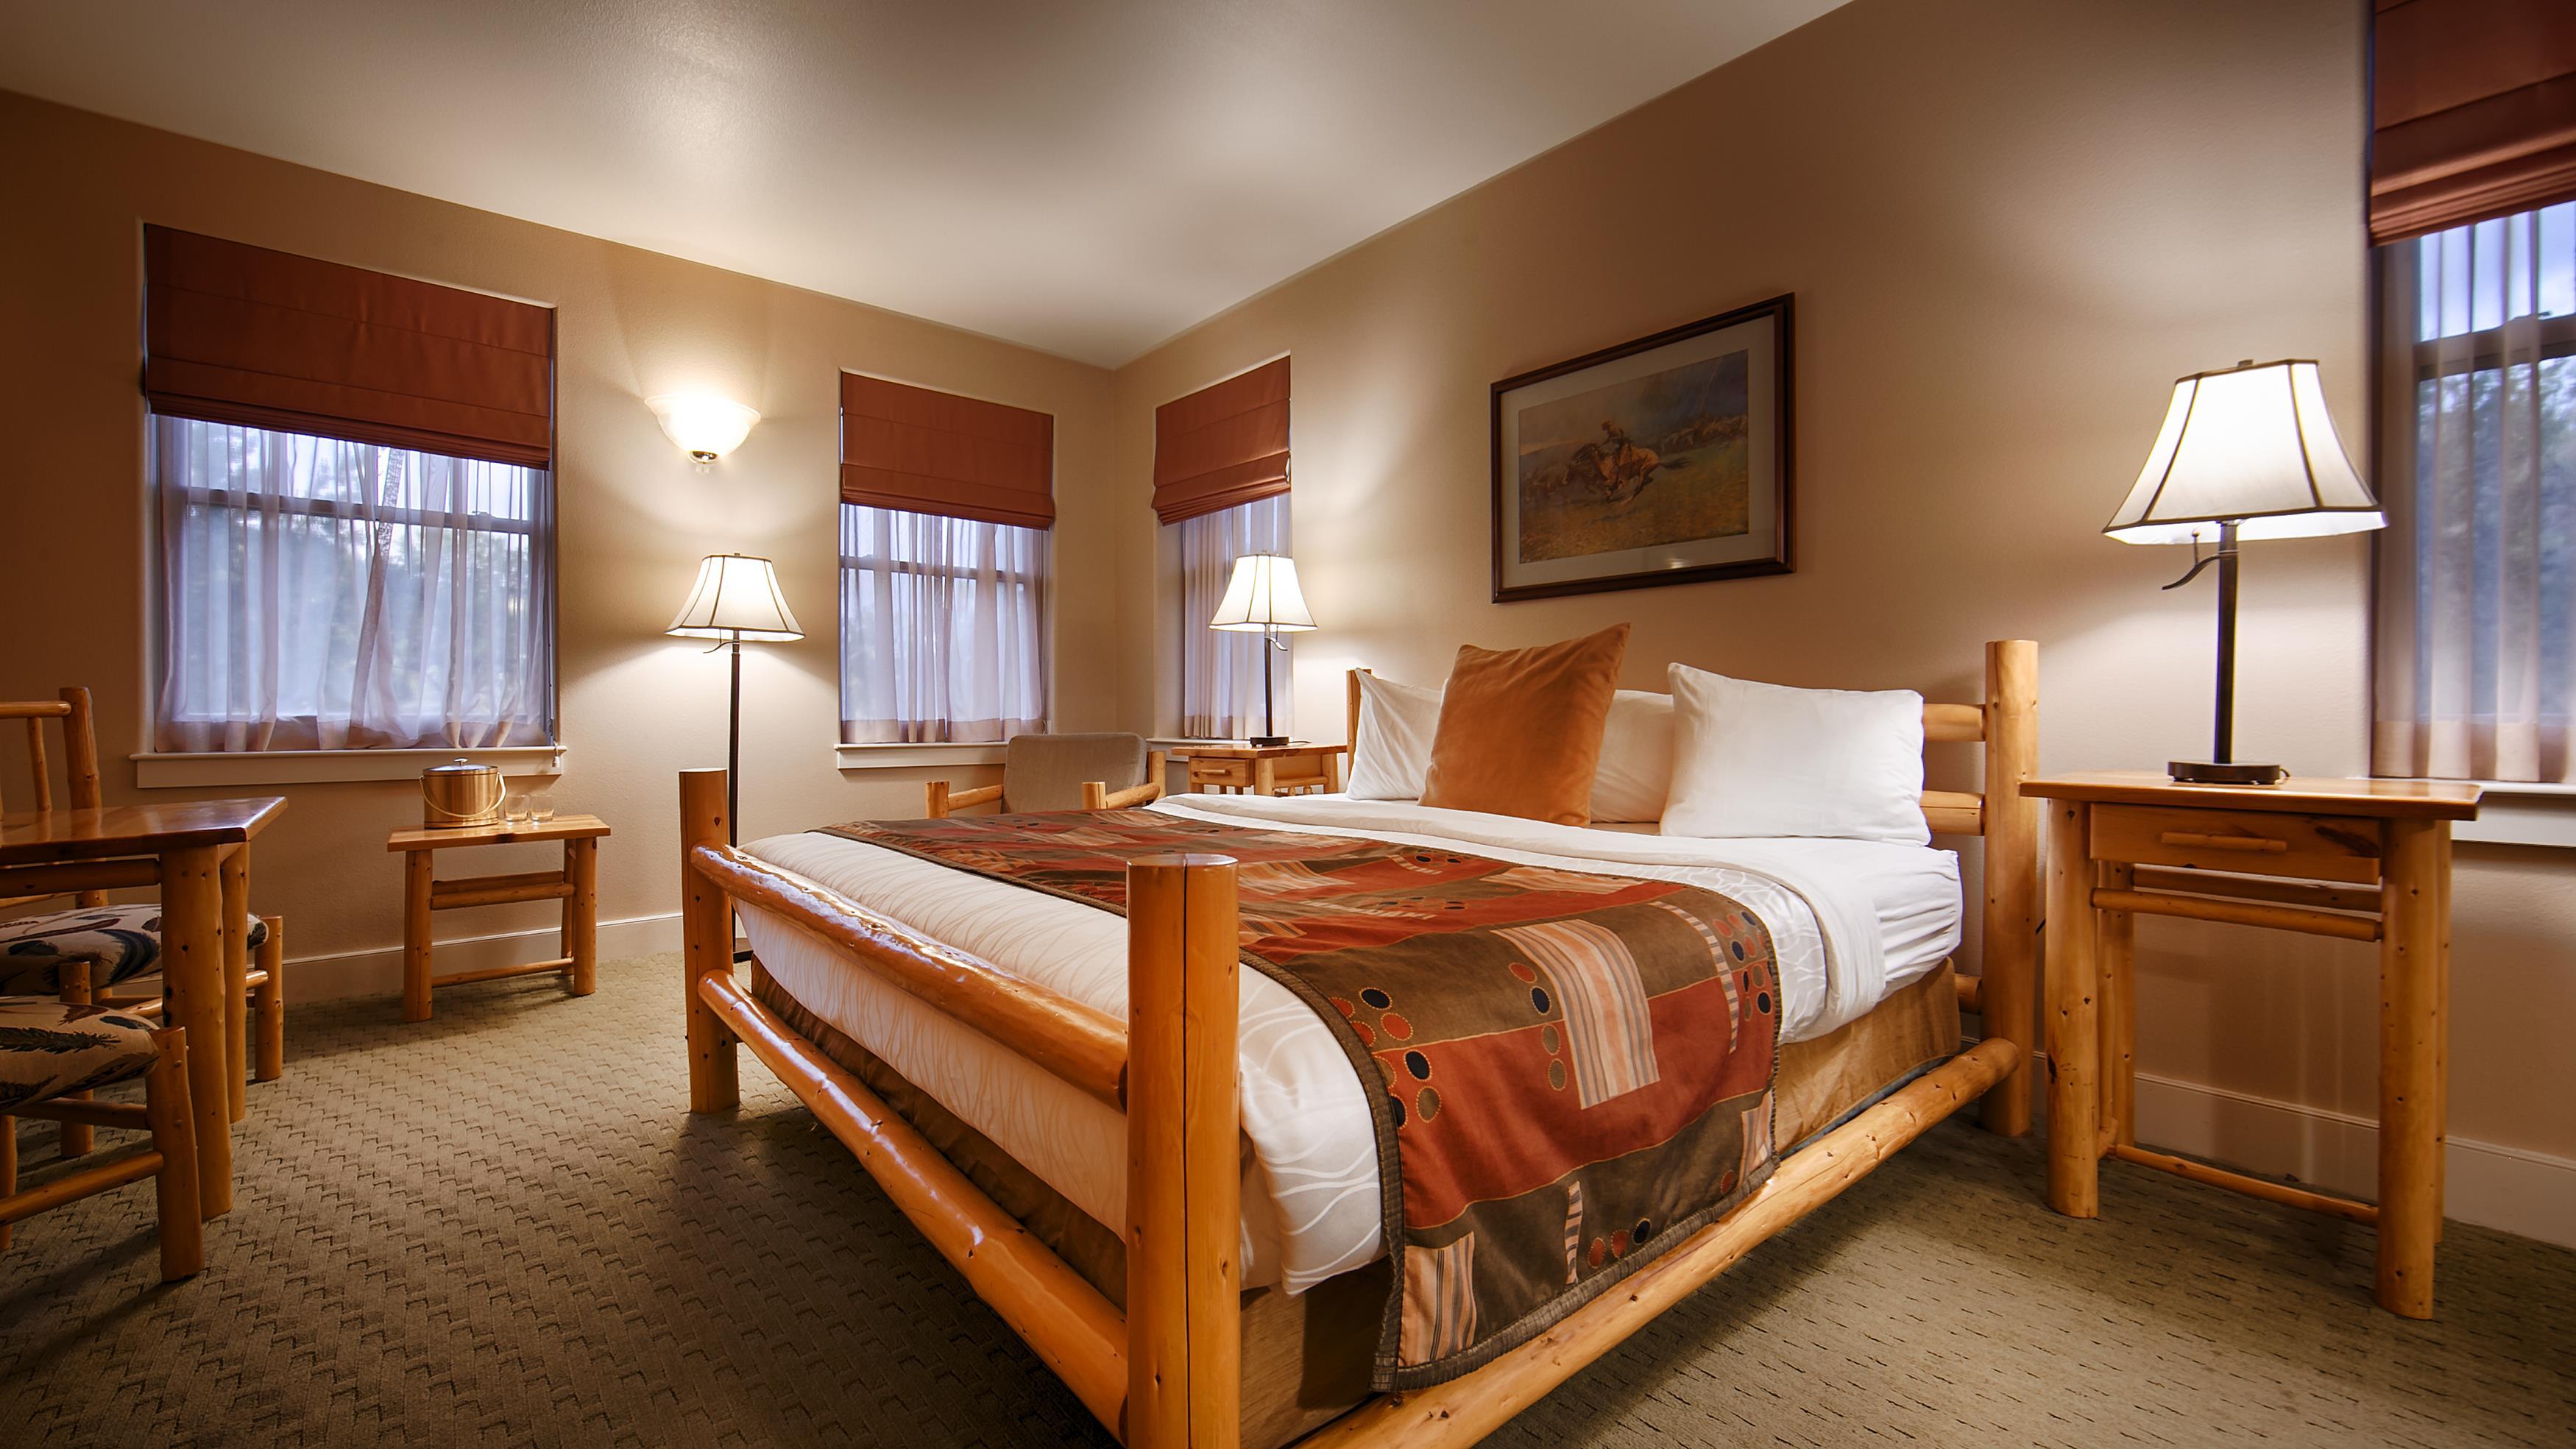 Best Western Plus Plaza Hotel image 21